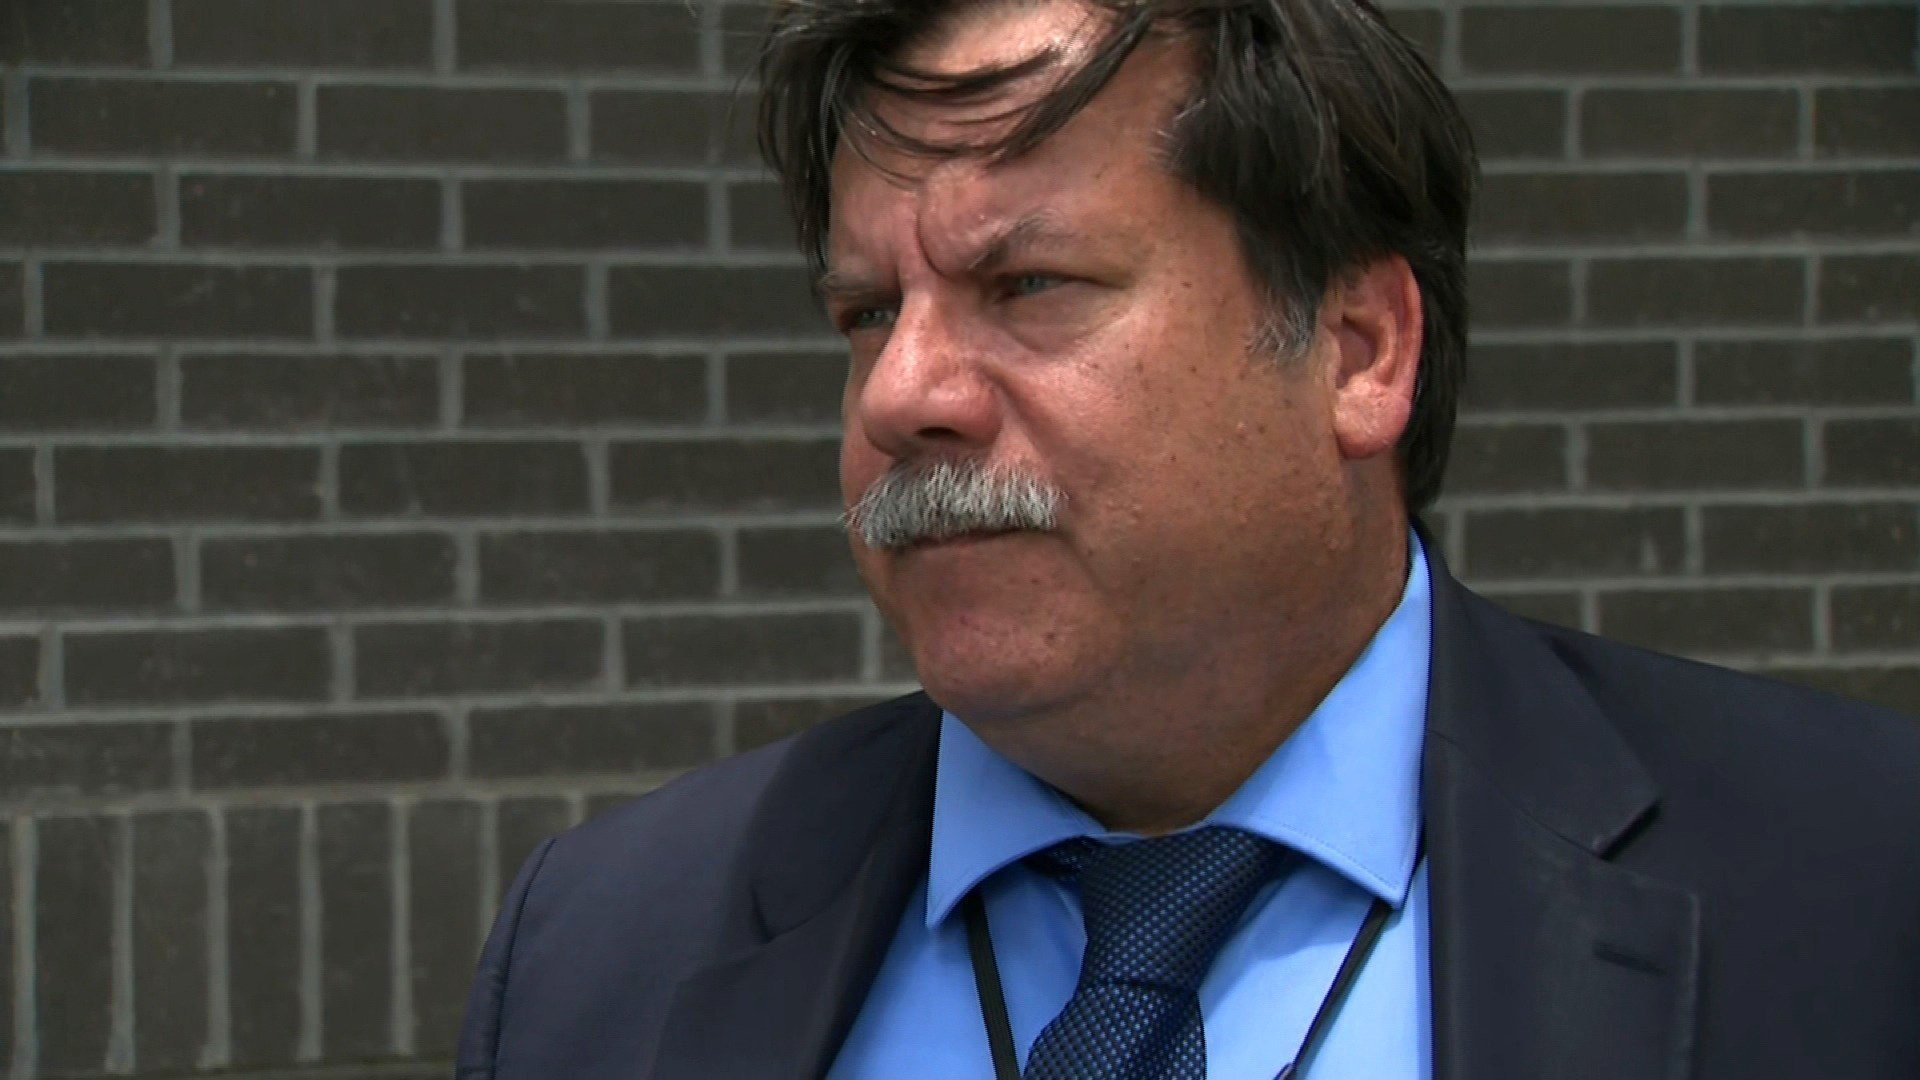 Miguel Nogueras is a public defender who handles immigration cases.